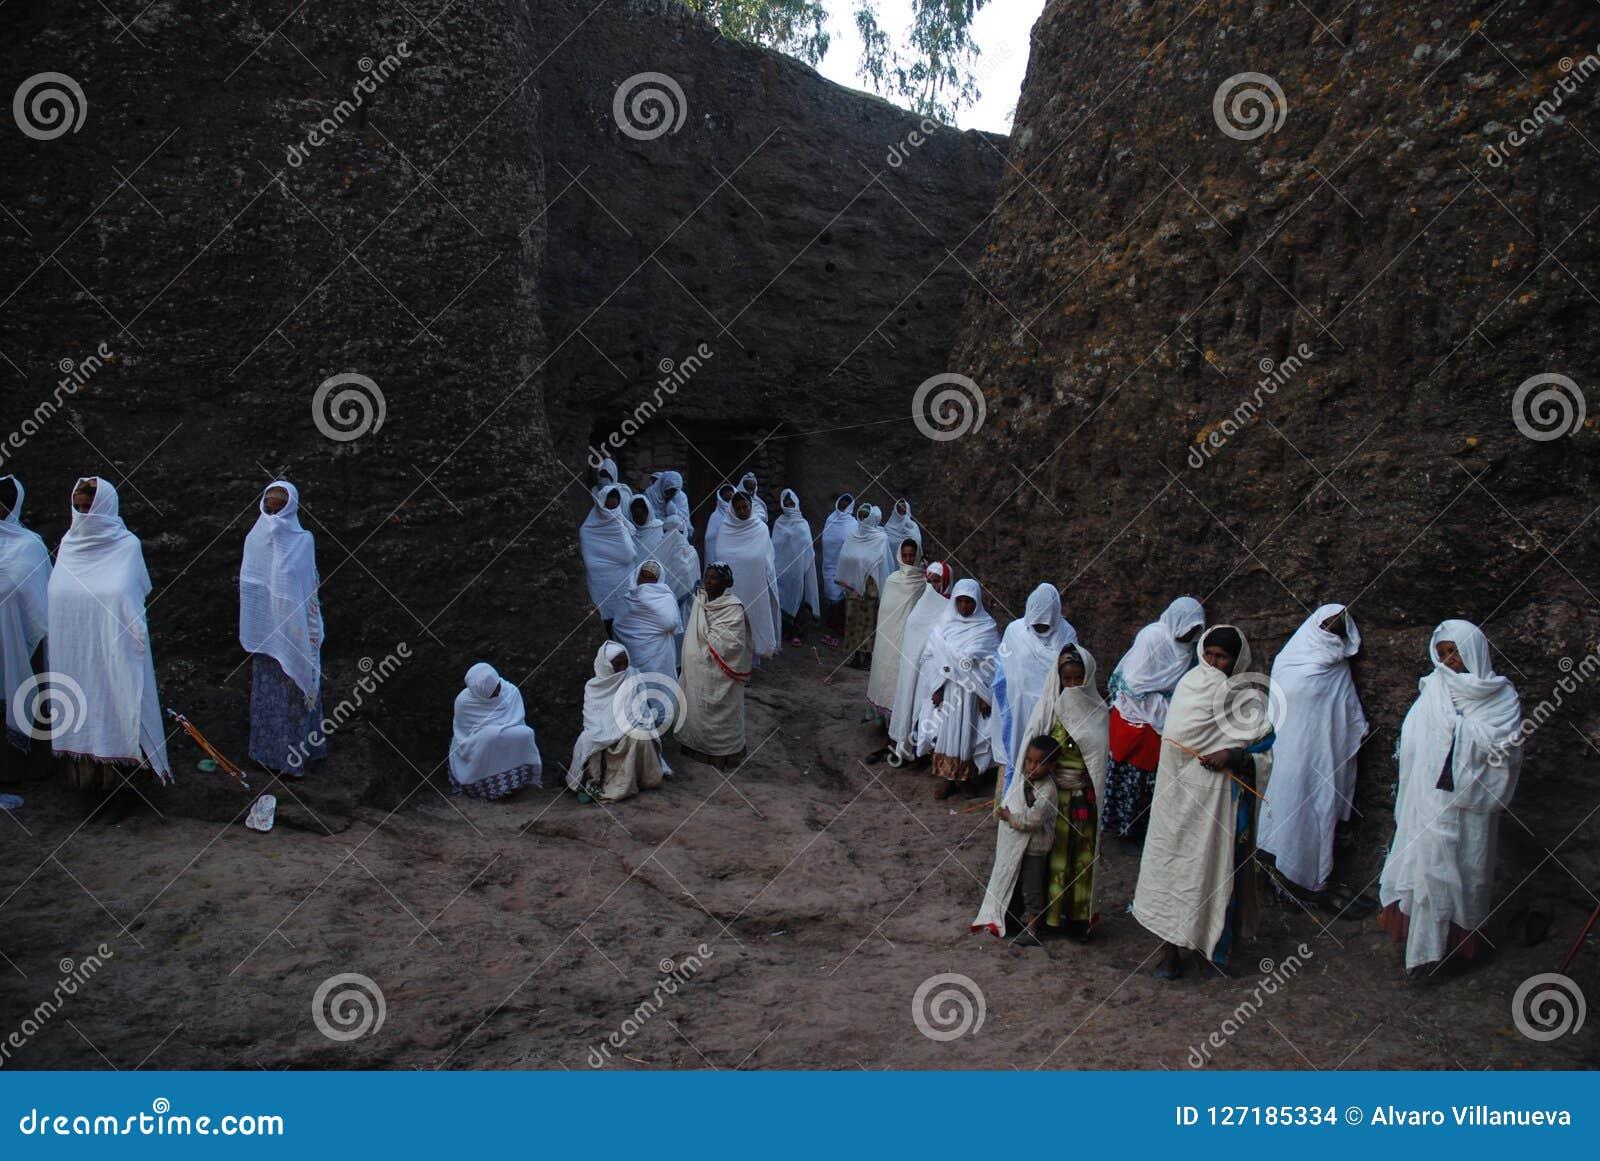 Lalibela, Wollo, Ethiopia: Pilgrims attending religious service